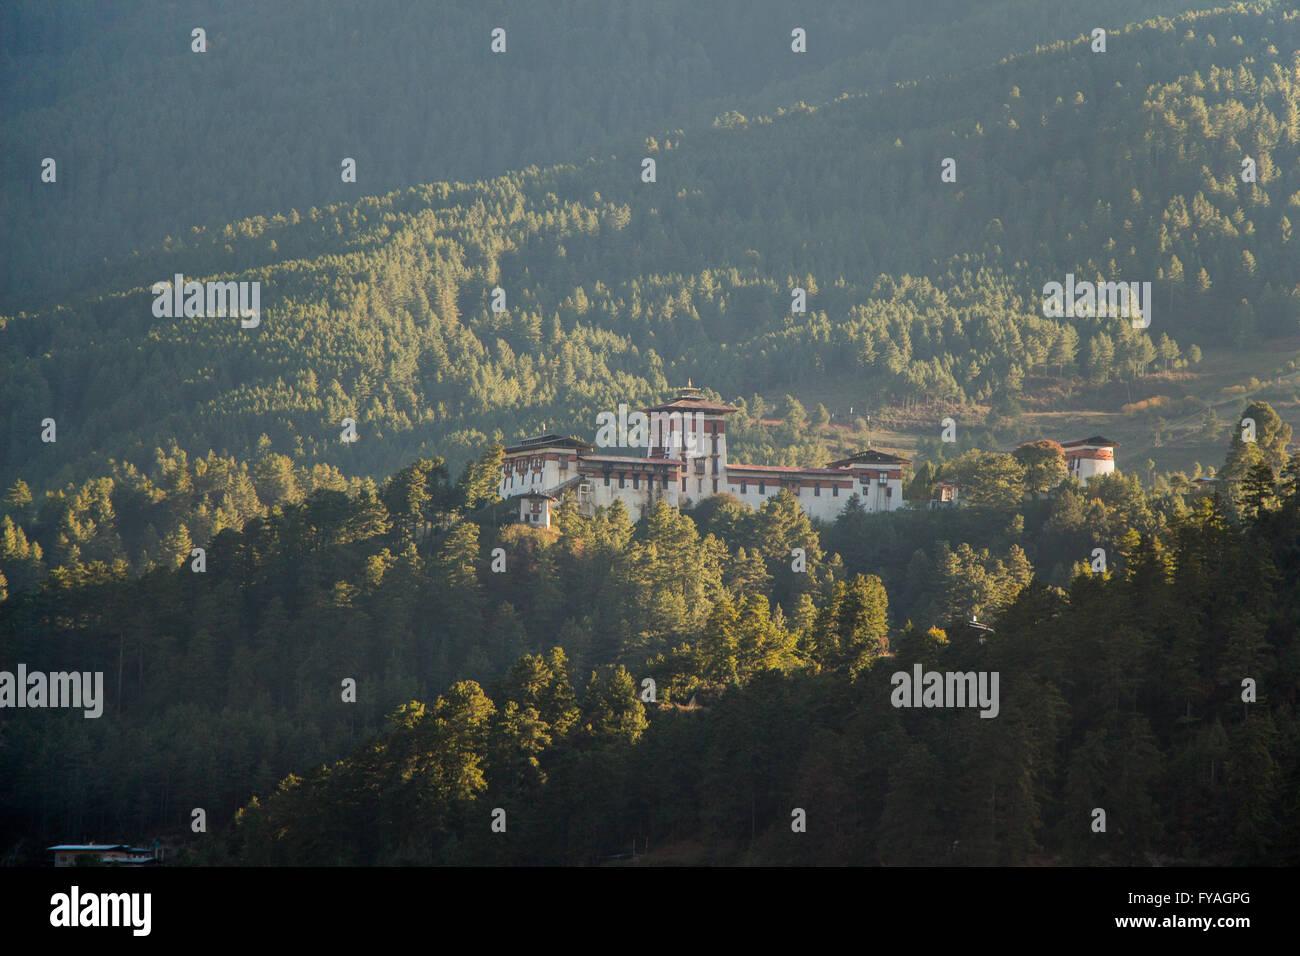 View of Jakar dzong in Bumthang, Bhutan - Stock Image